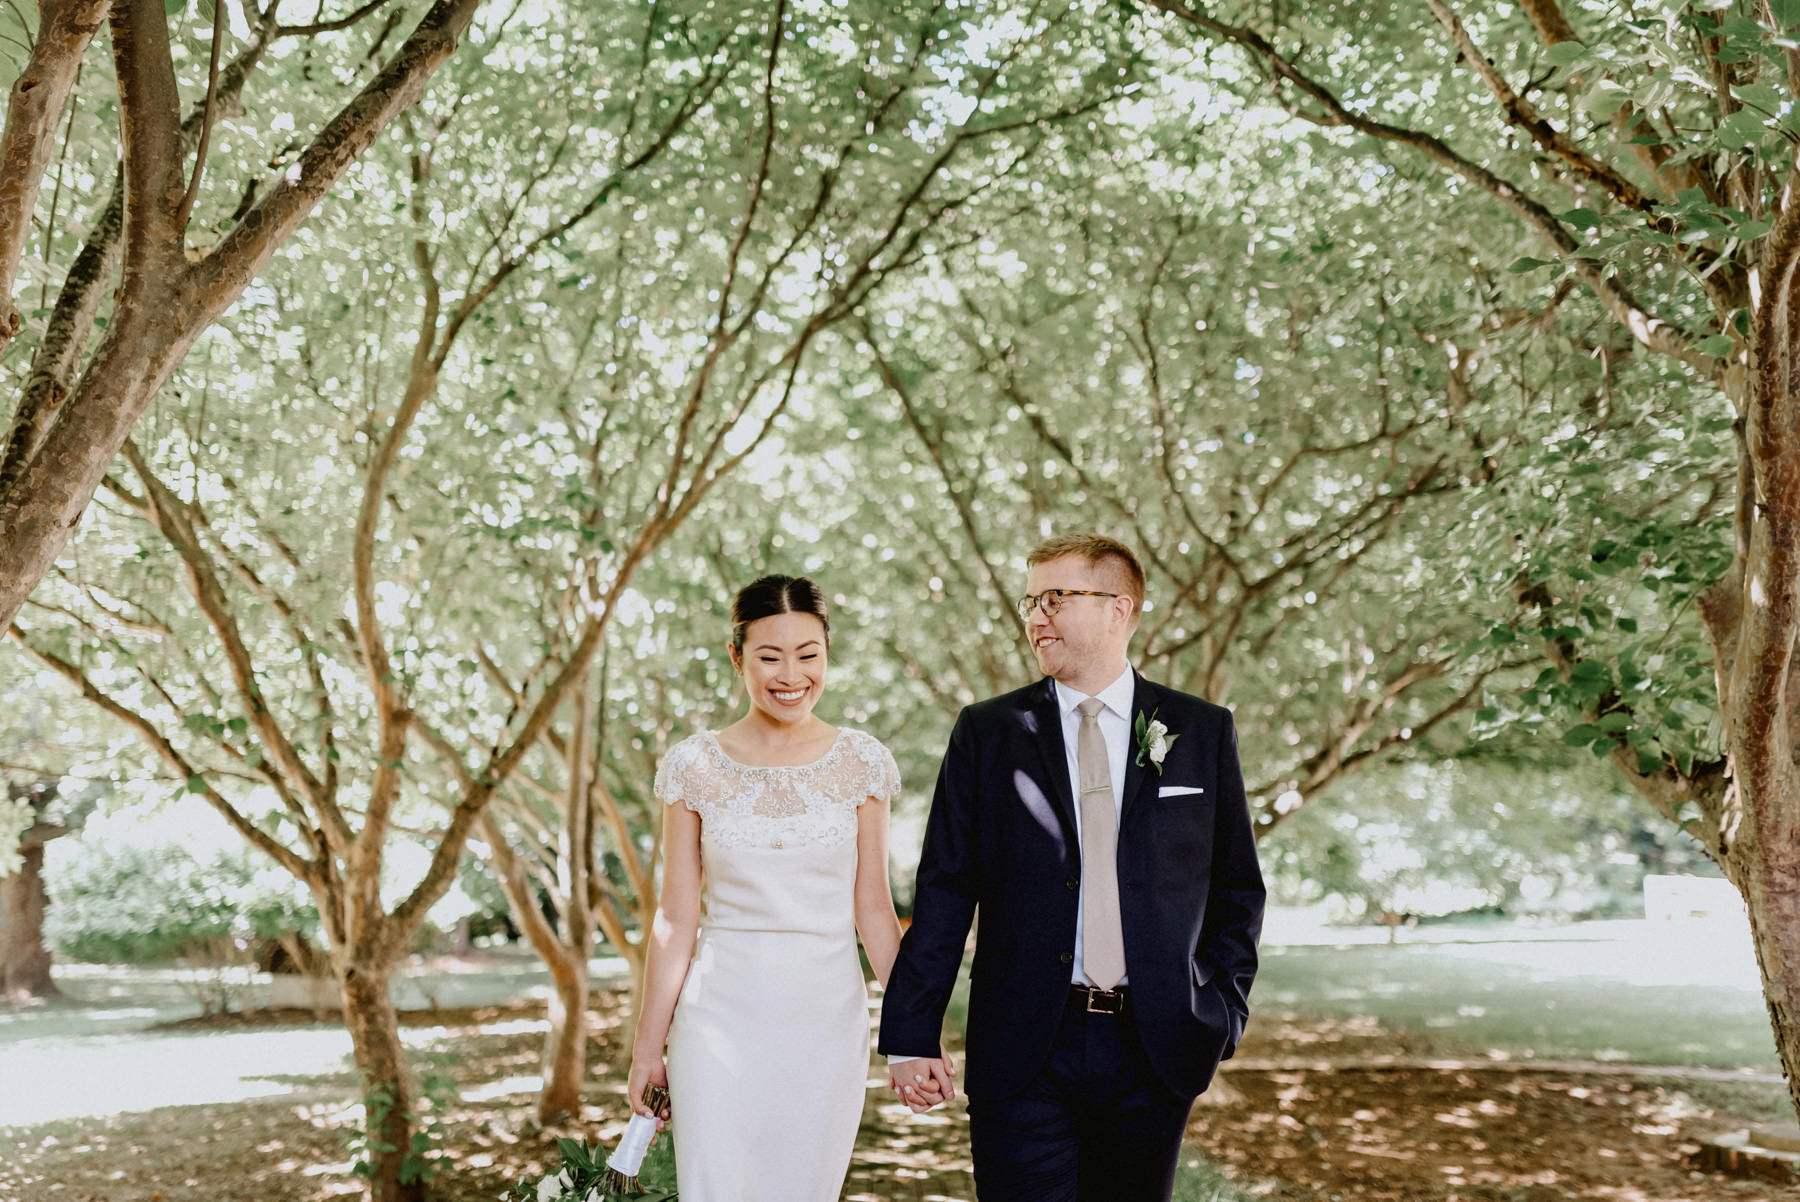 Appleford-estate-wedding-62.jpg